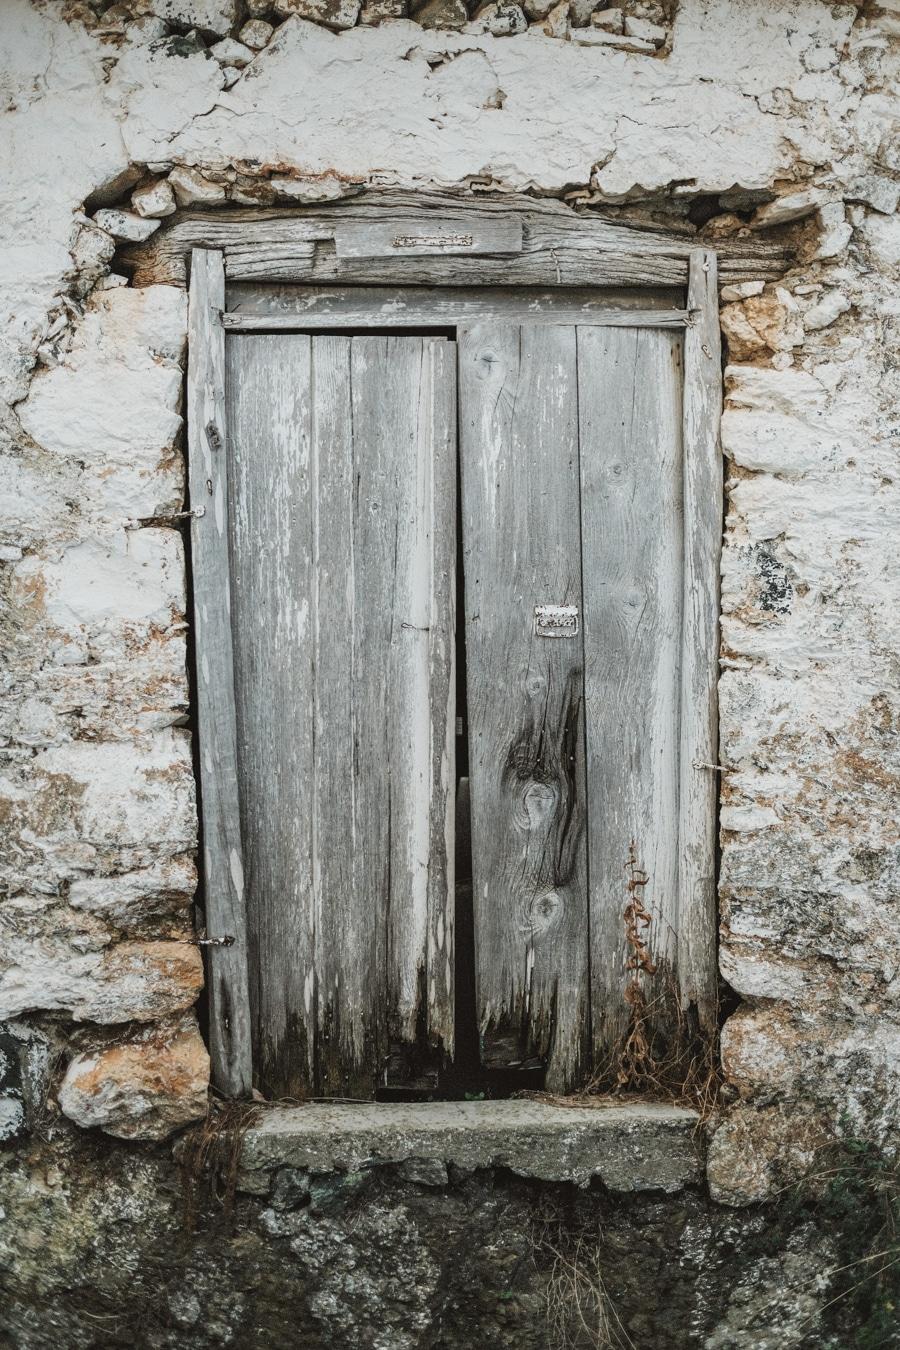 Kinlake-Lifestyle-Skillshare-Crete-3794